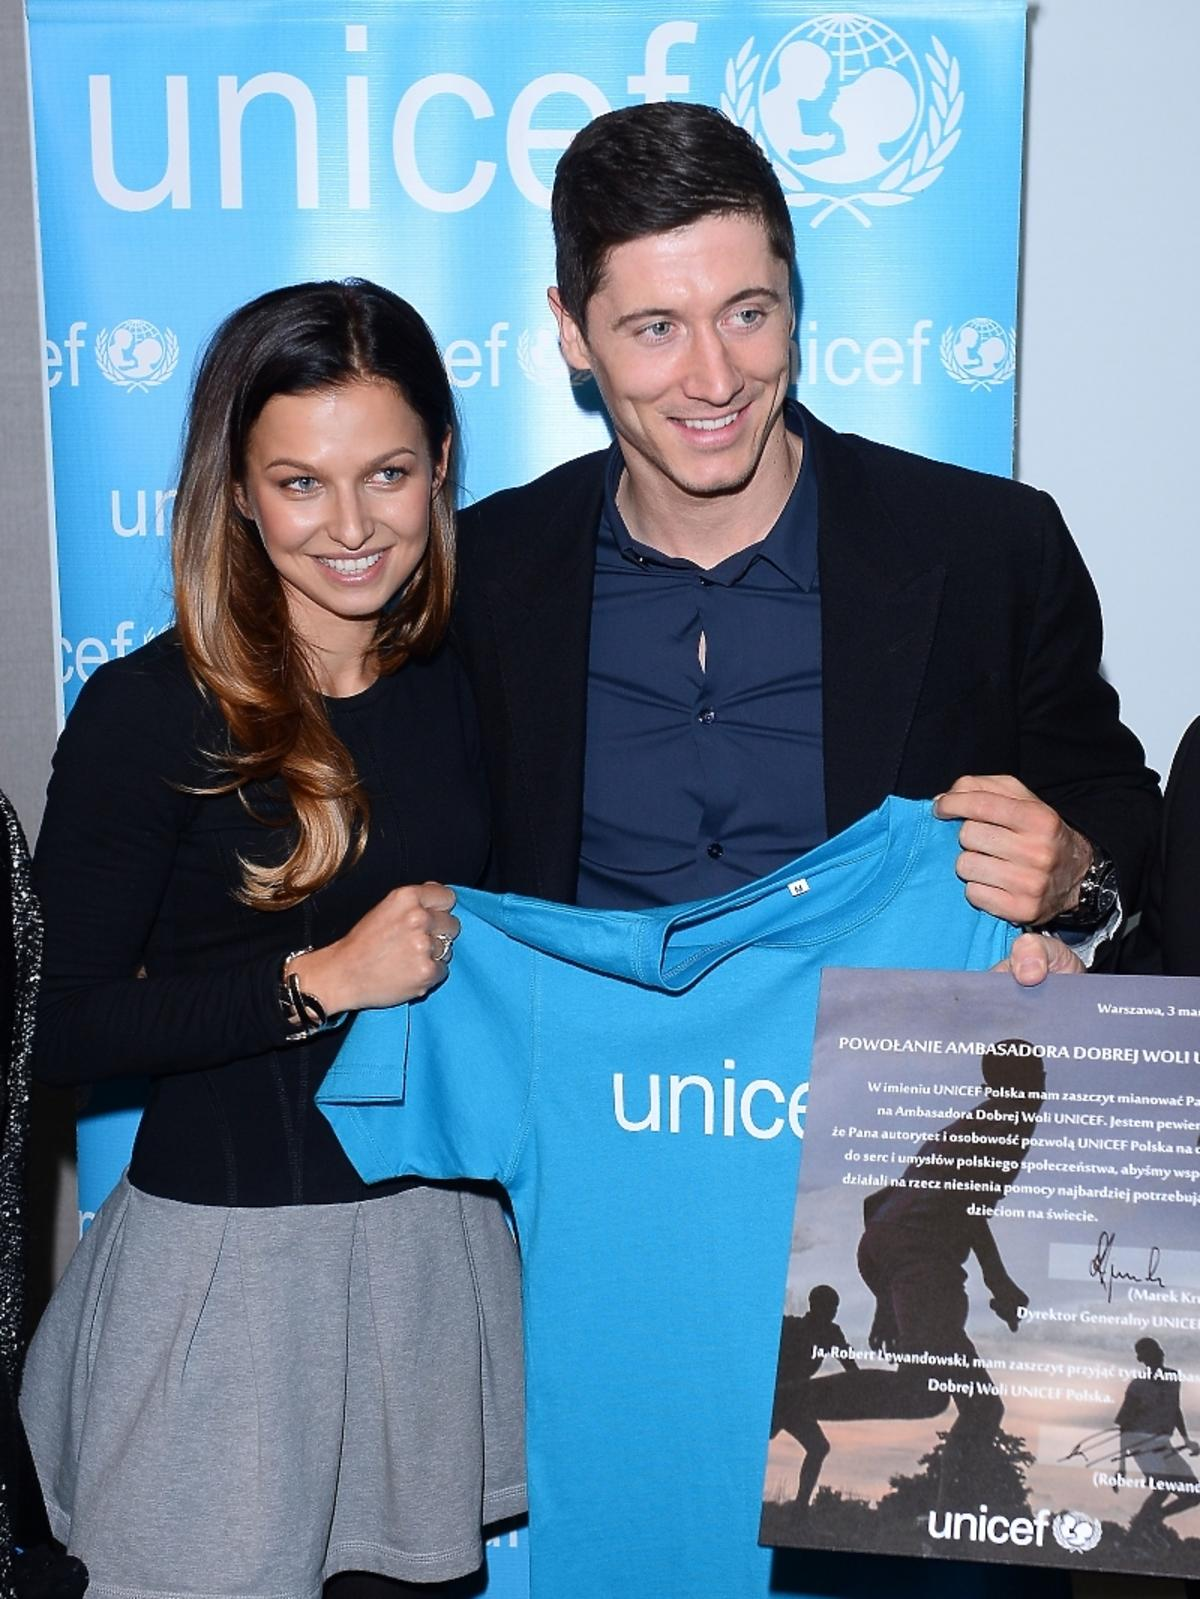 Anna Lewandowska i Robert Lewandowski na konferencji UNICEF